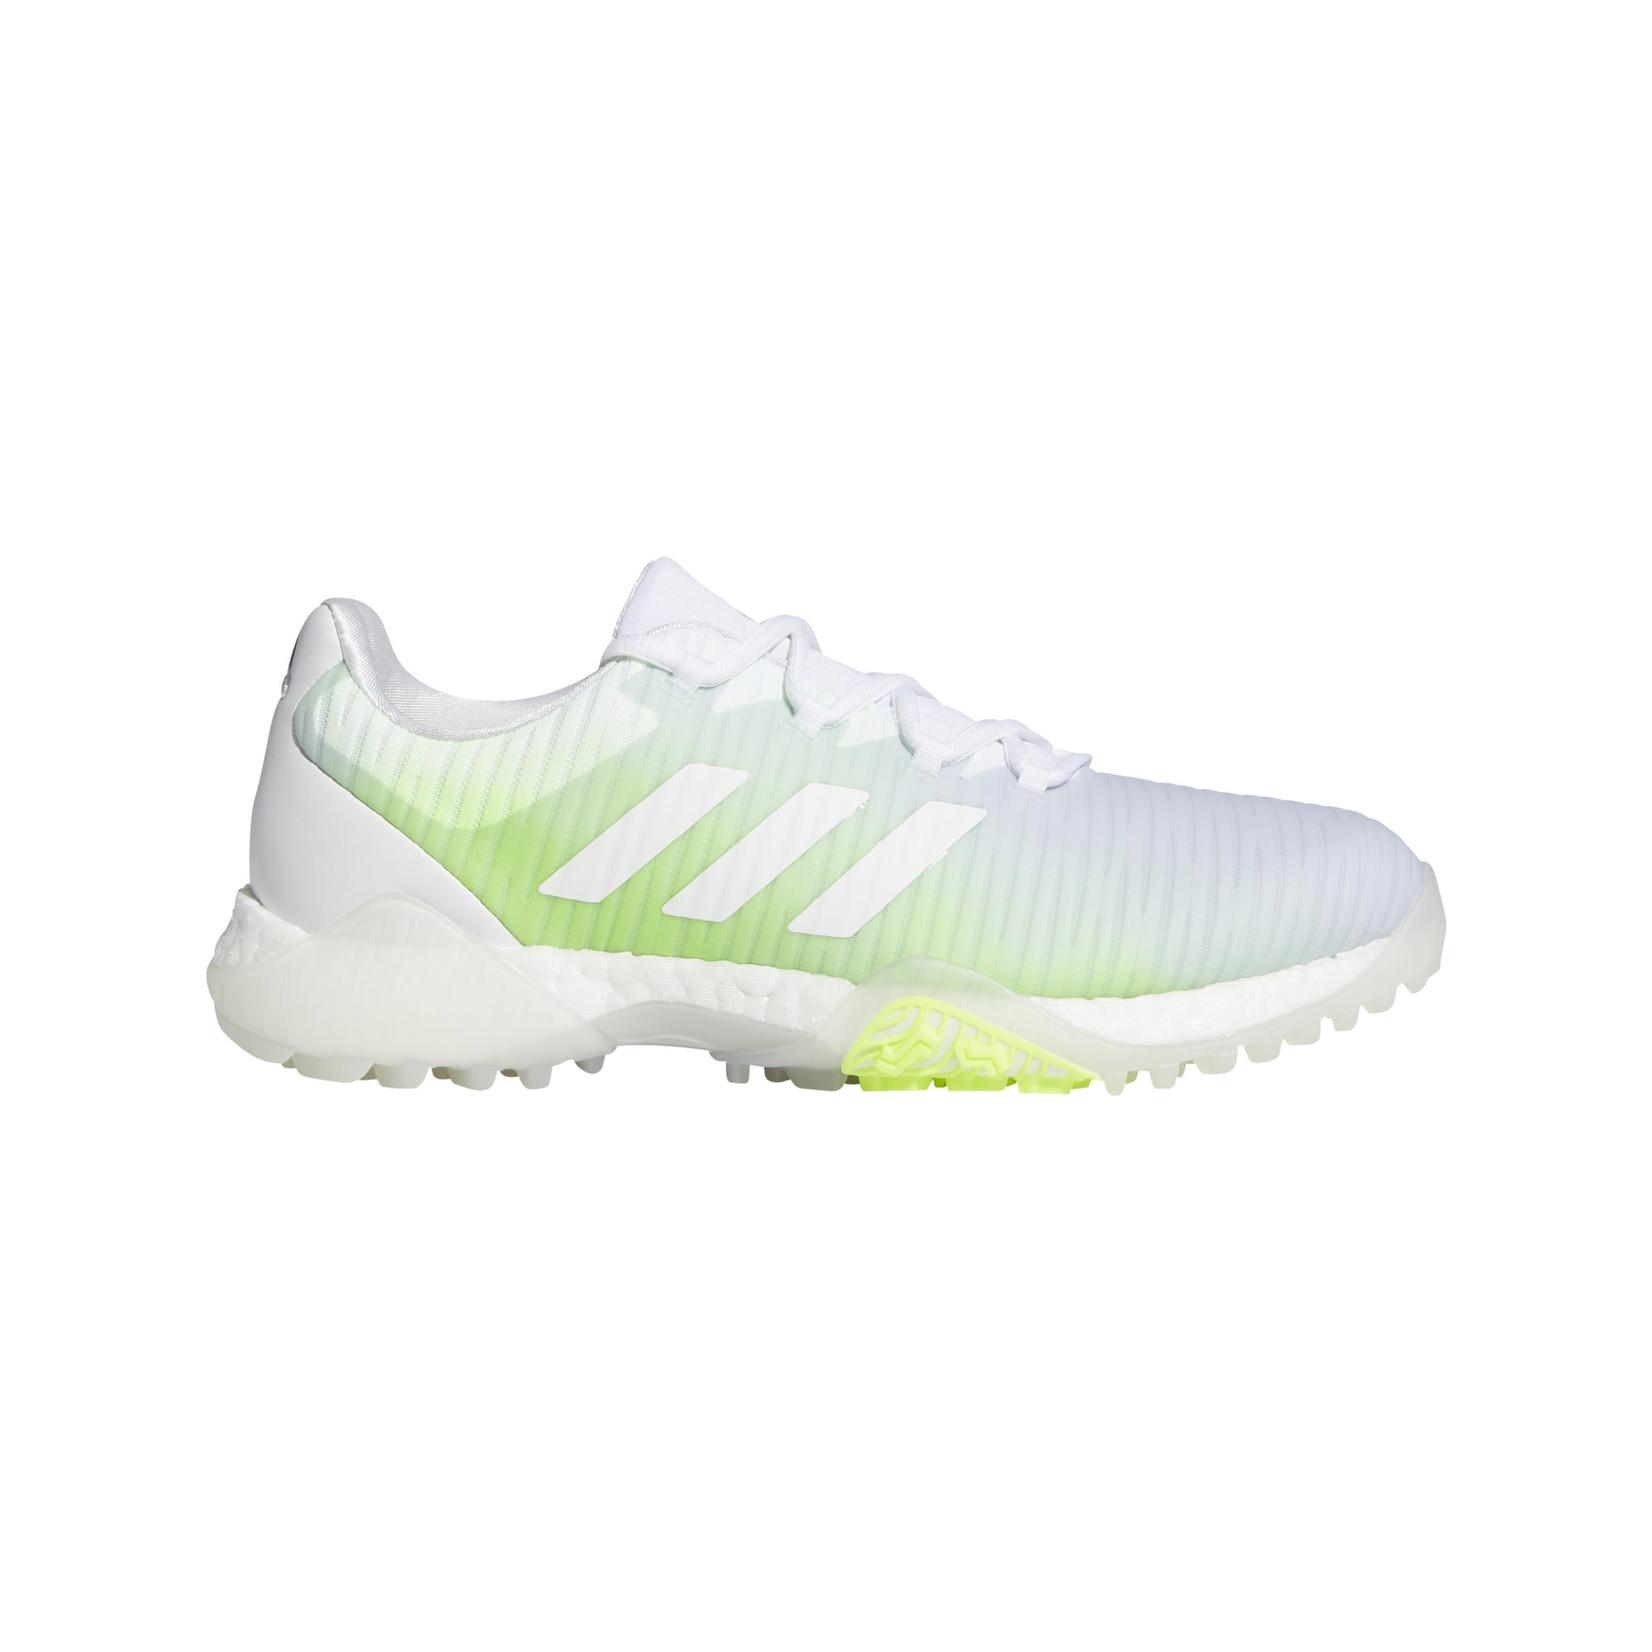 Adidas Adidas W Codechaos Wit/Groen UK 6.5 / 39 1/3